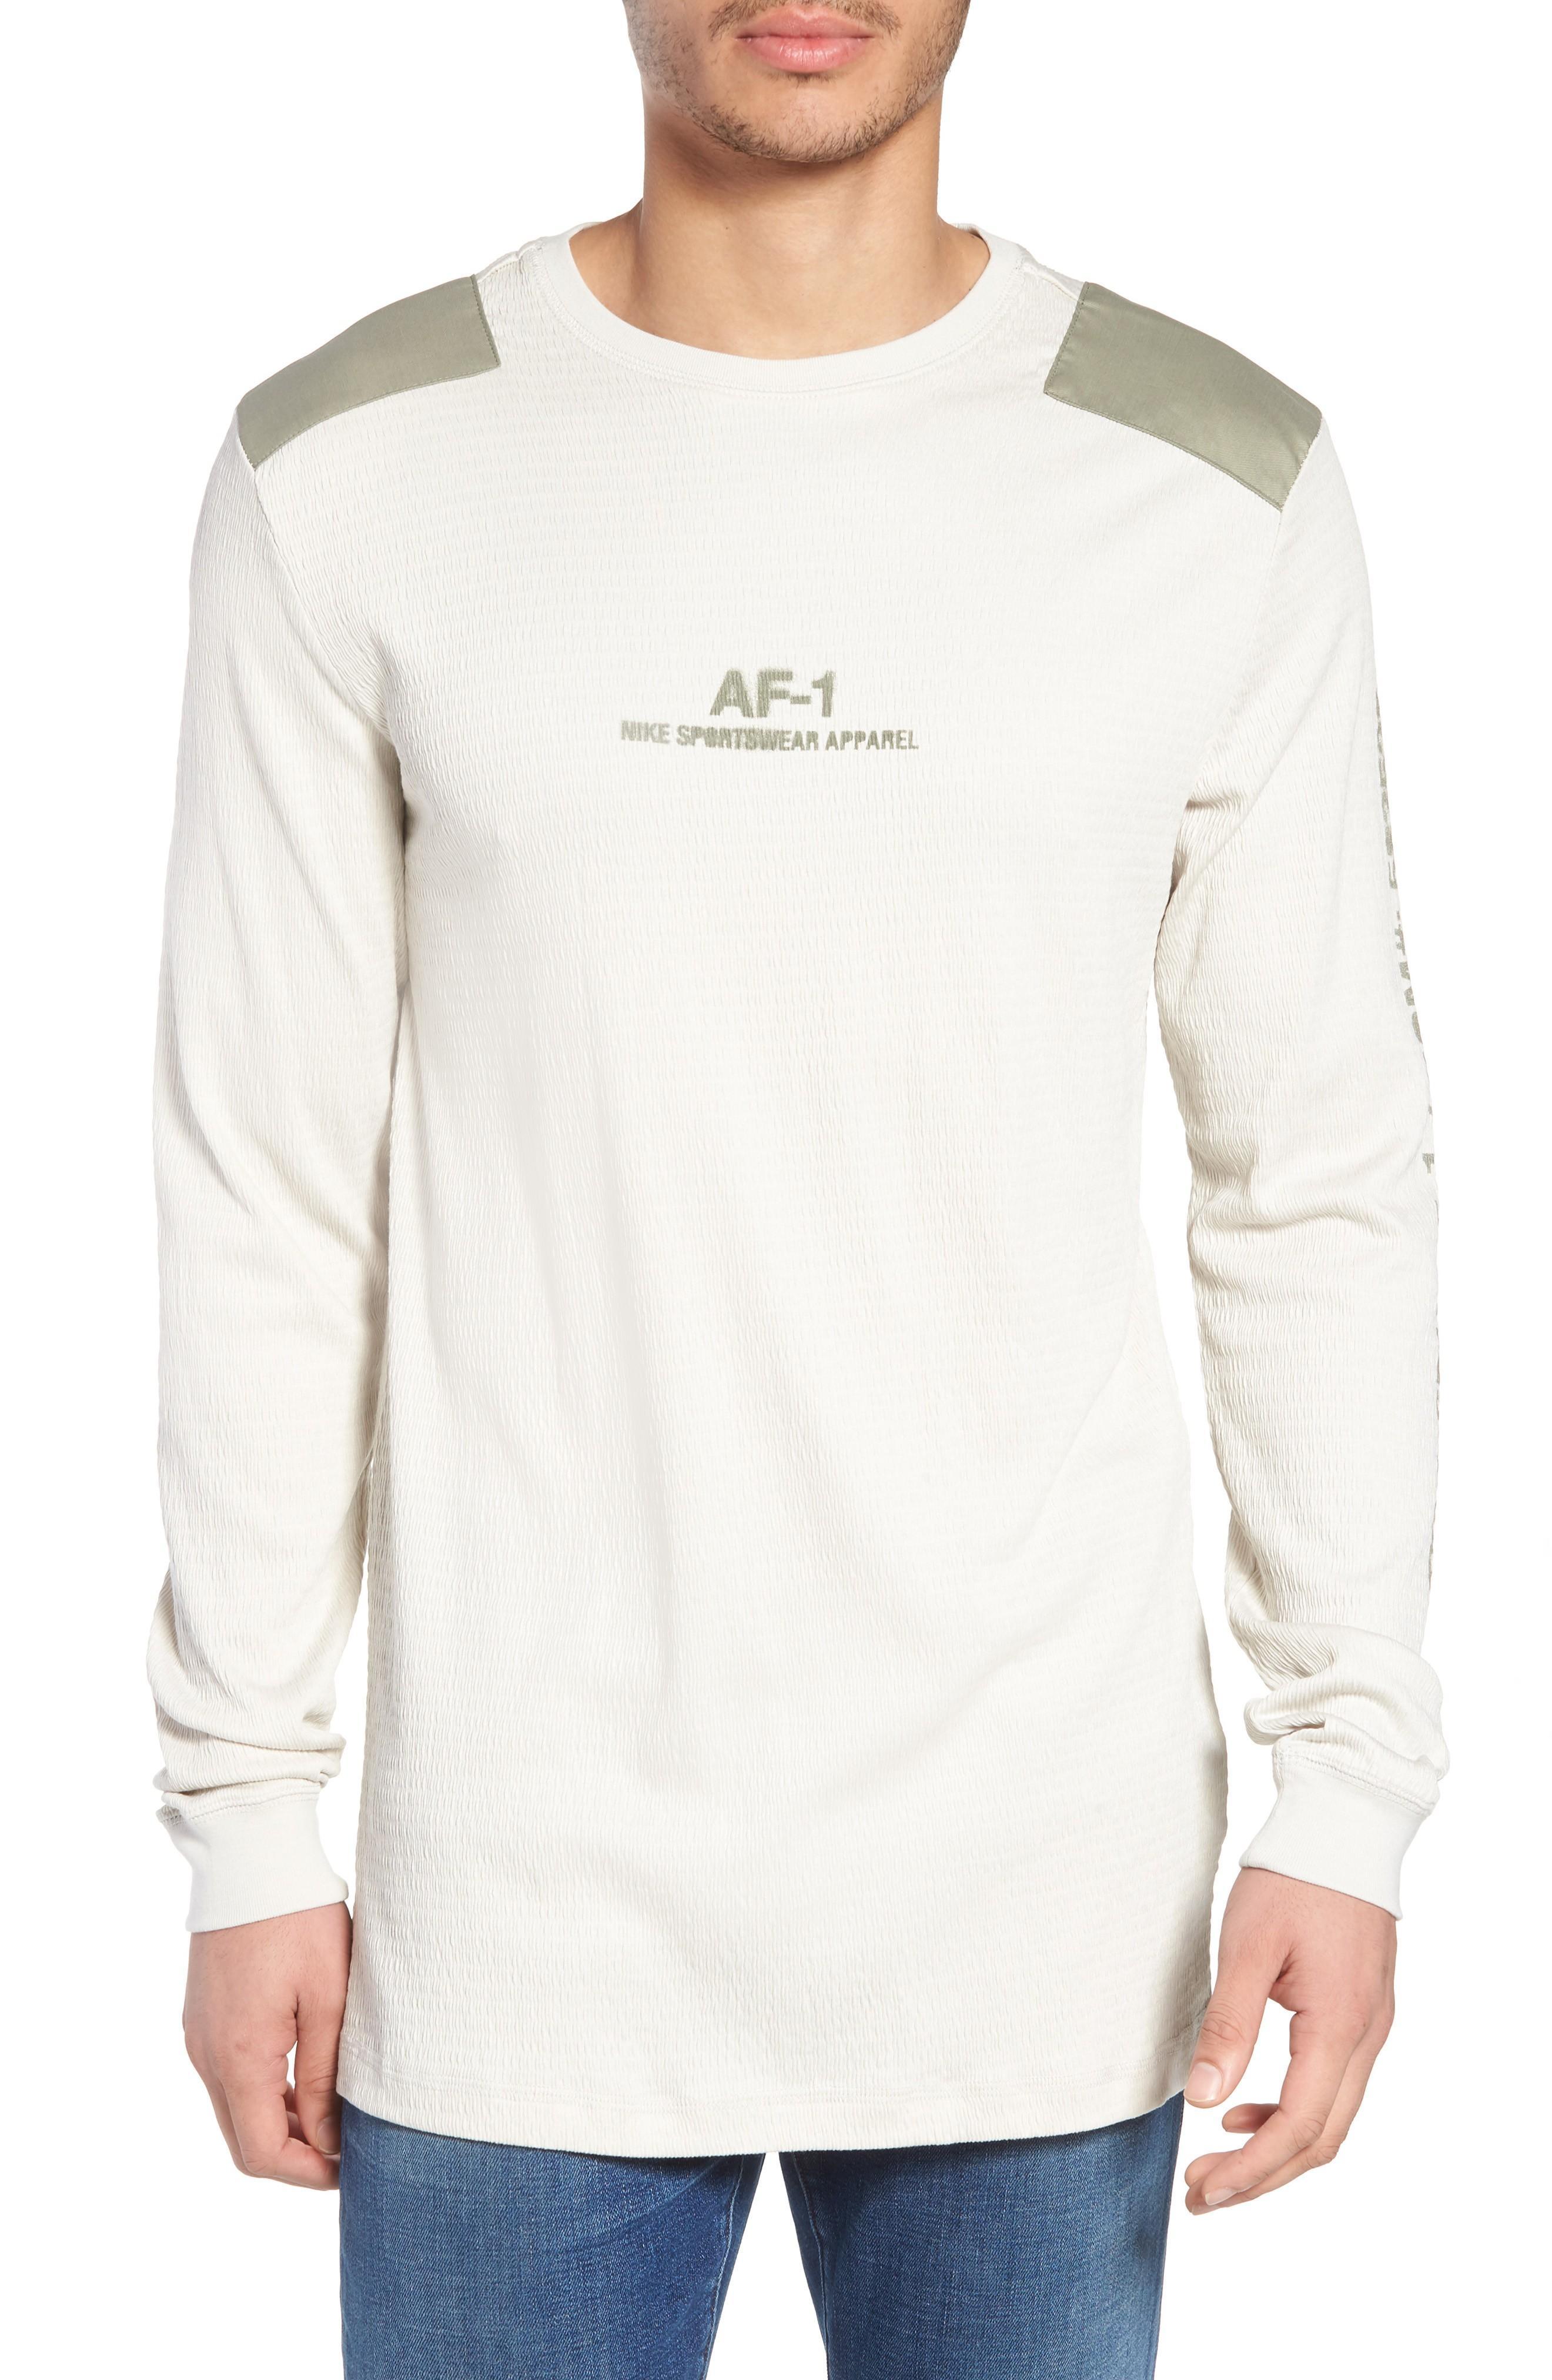 debee9a2 Nike Sportswear Af-1 Long Sleeve Shirt In Light Bone/ Stucco/ Stucco ...